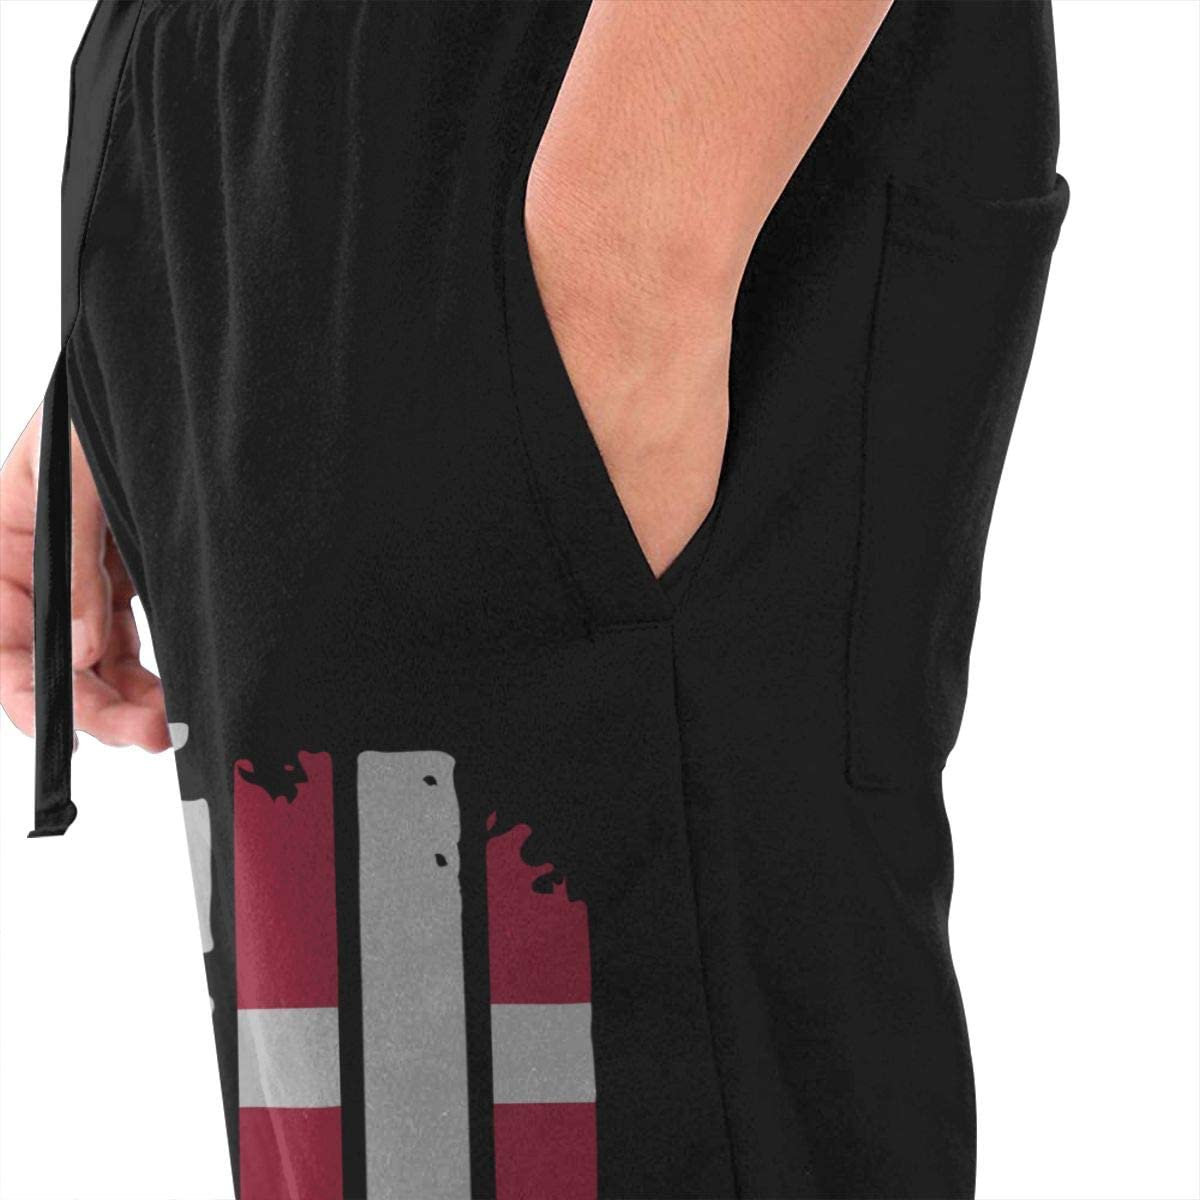 BibiQQgait Mens Jogger Sweatpants Danish American Flag Elastic Waist Fleece Sweatpants